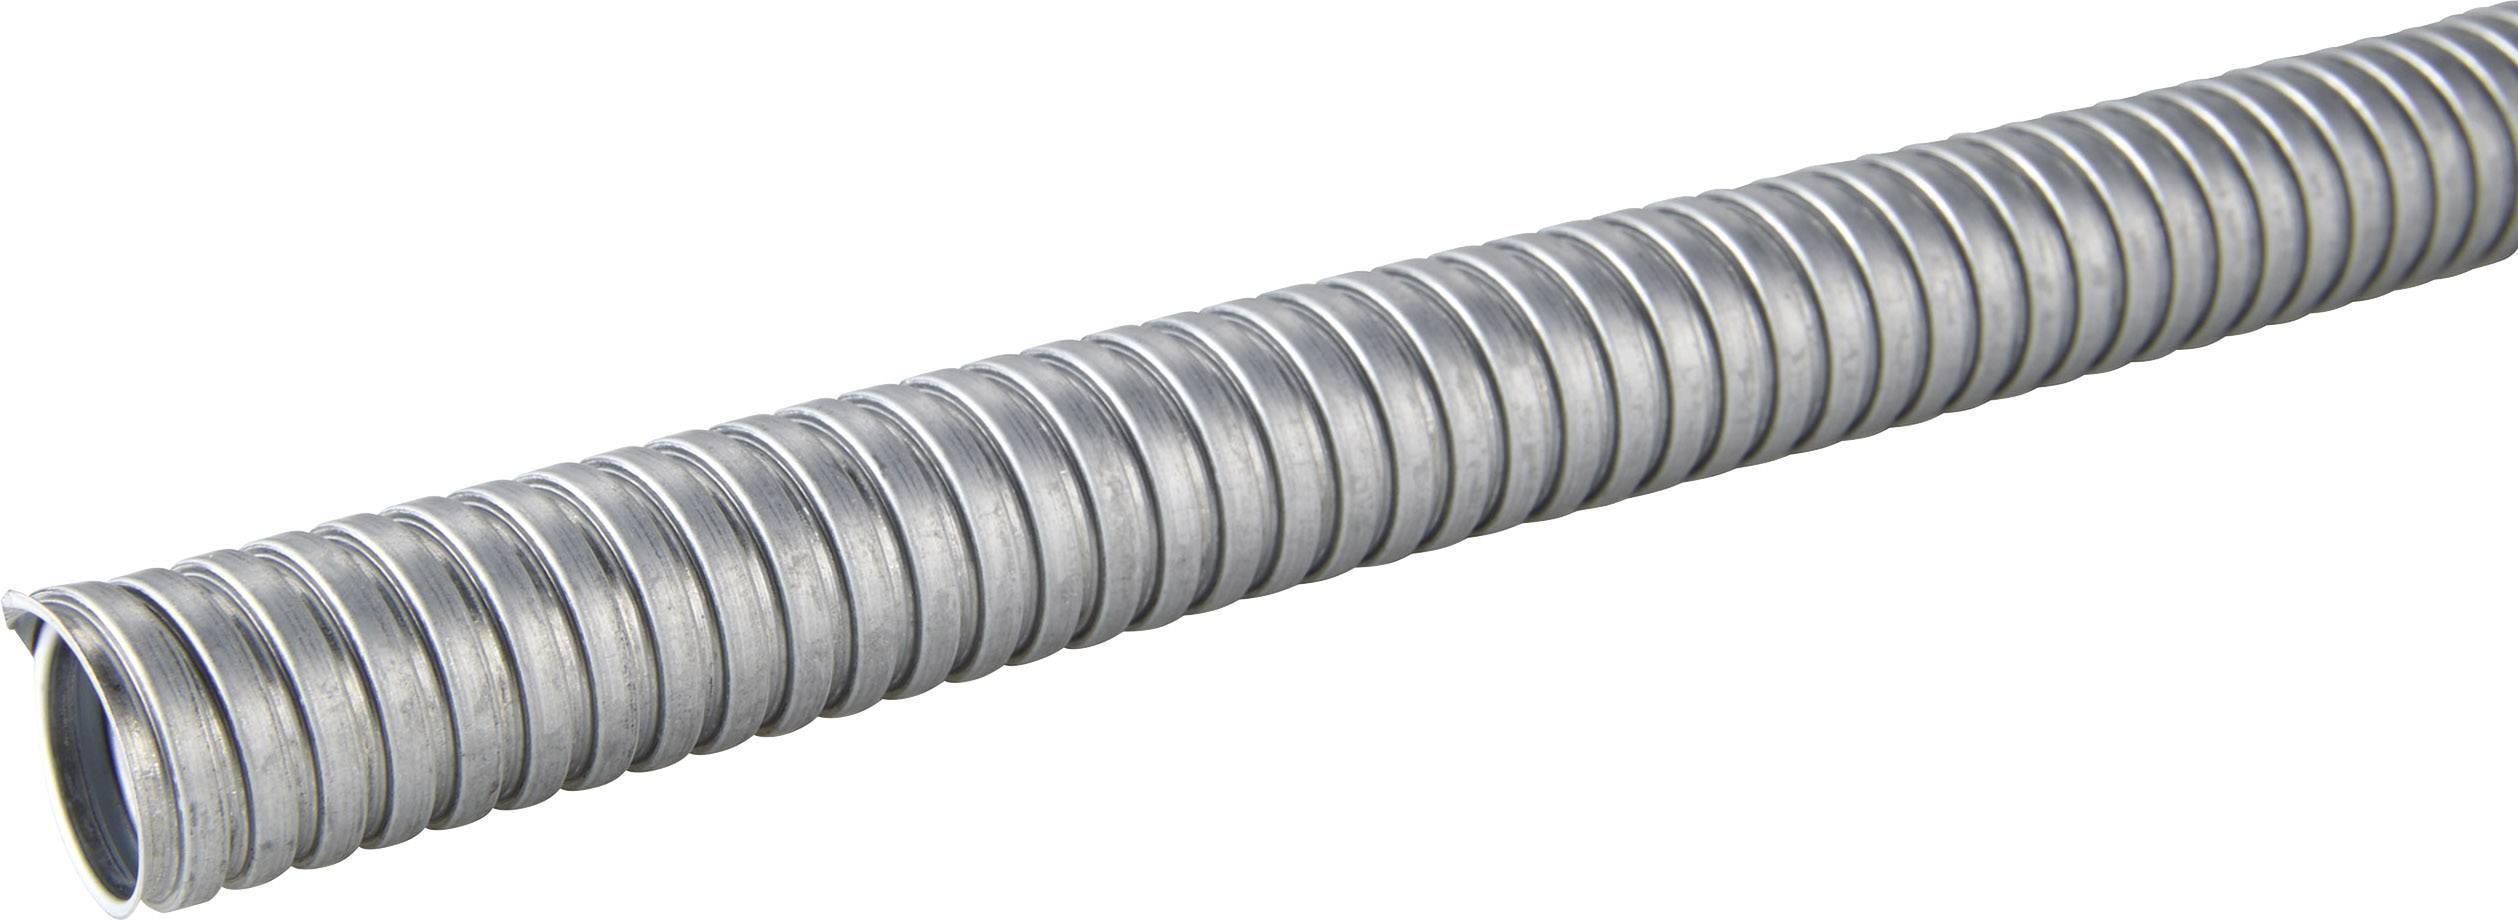 Ochranná hadice na kov LappKabel SILVYN® AS 16/18x21 61802120, stříbrná, 50 m